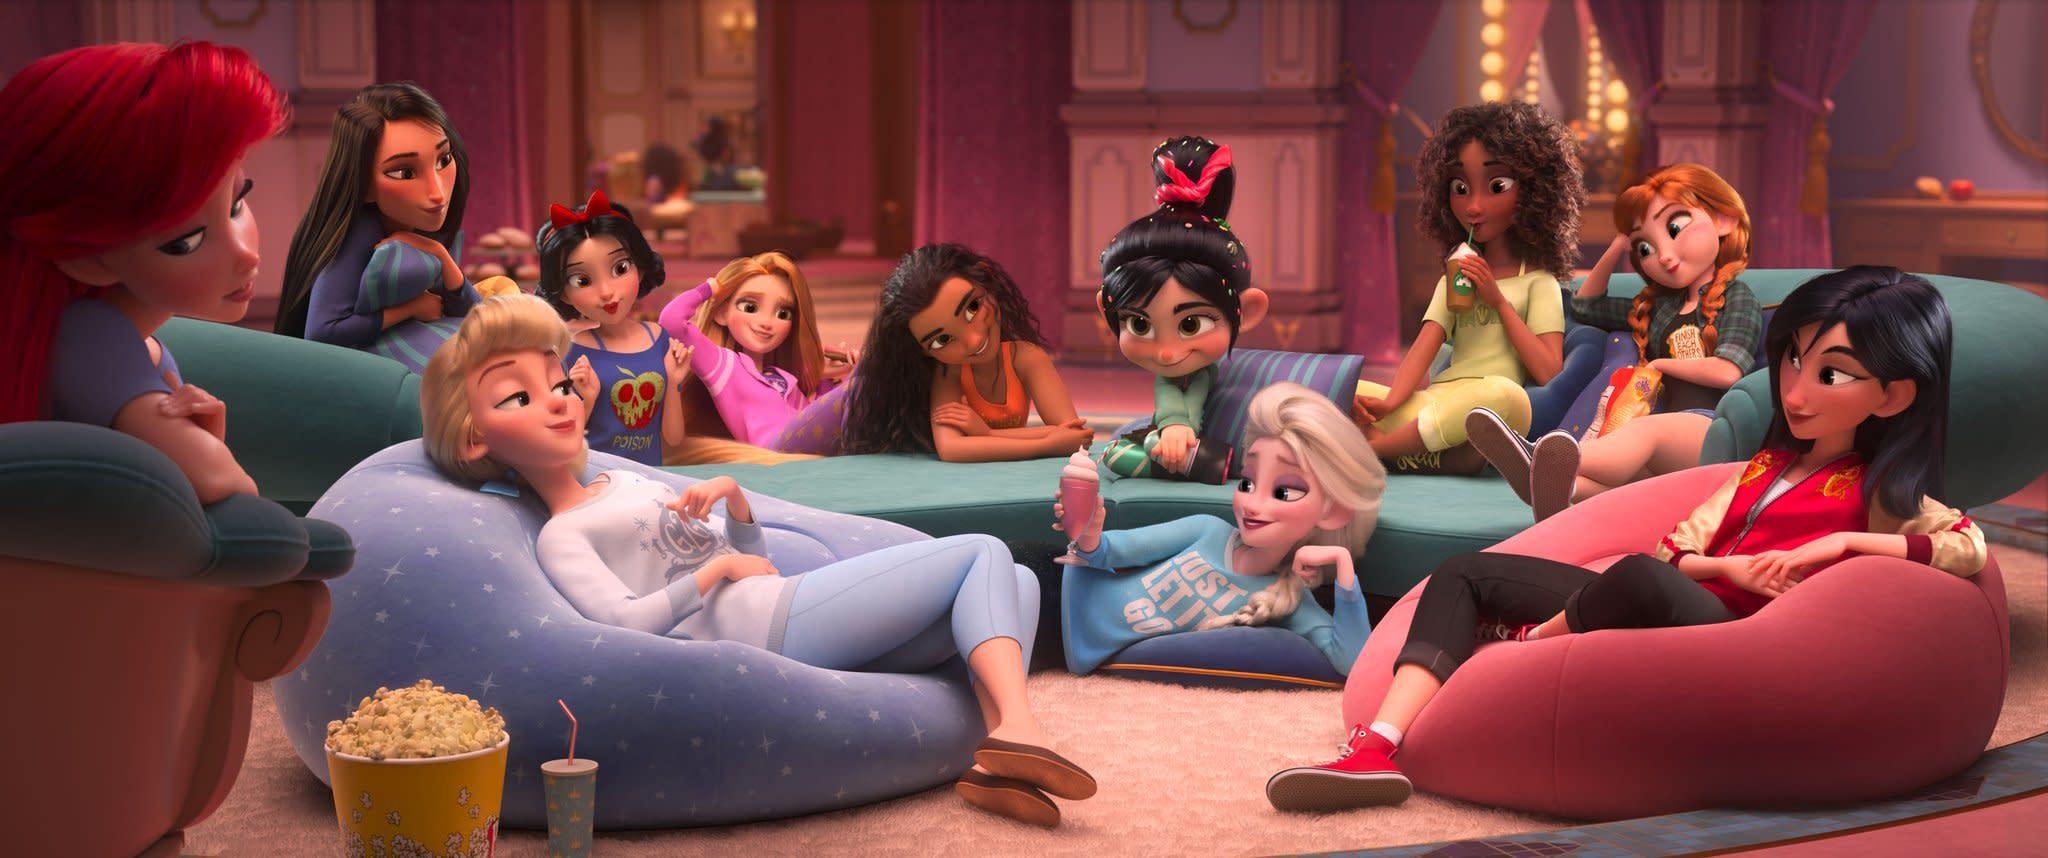 Disney Responds To Wreck It Ralph 2 Whitewashing Outcry